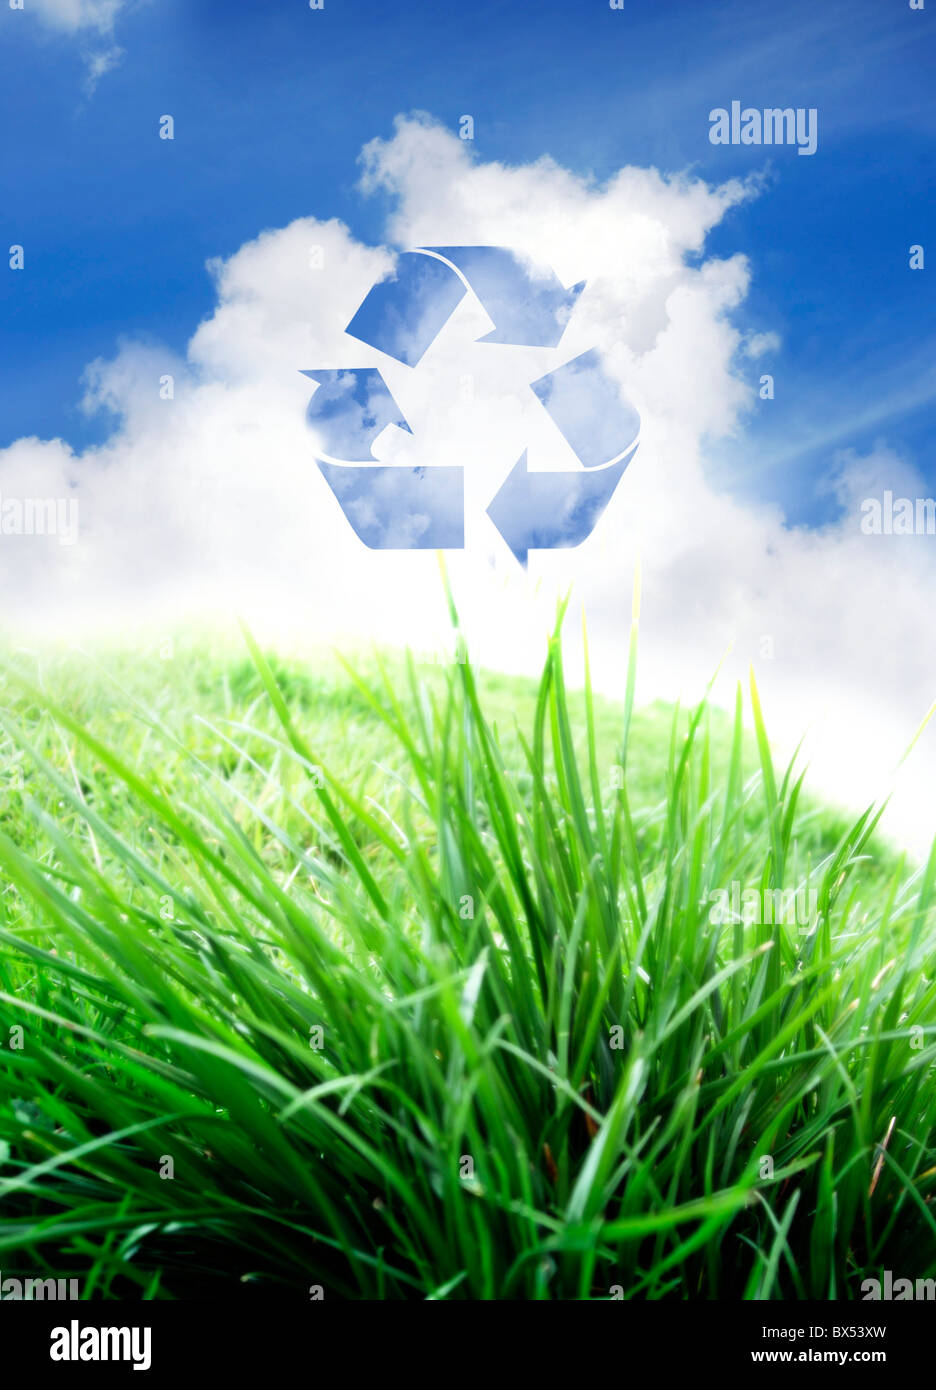 Green living, conceptual artwork - Stock Image